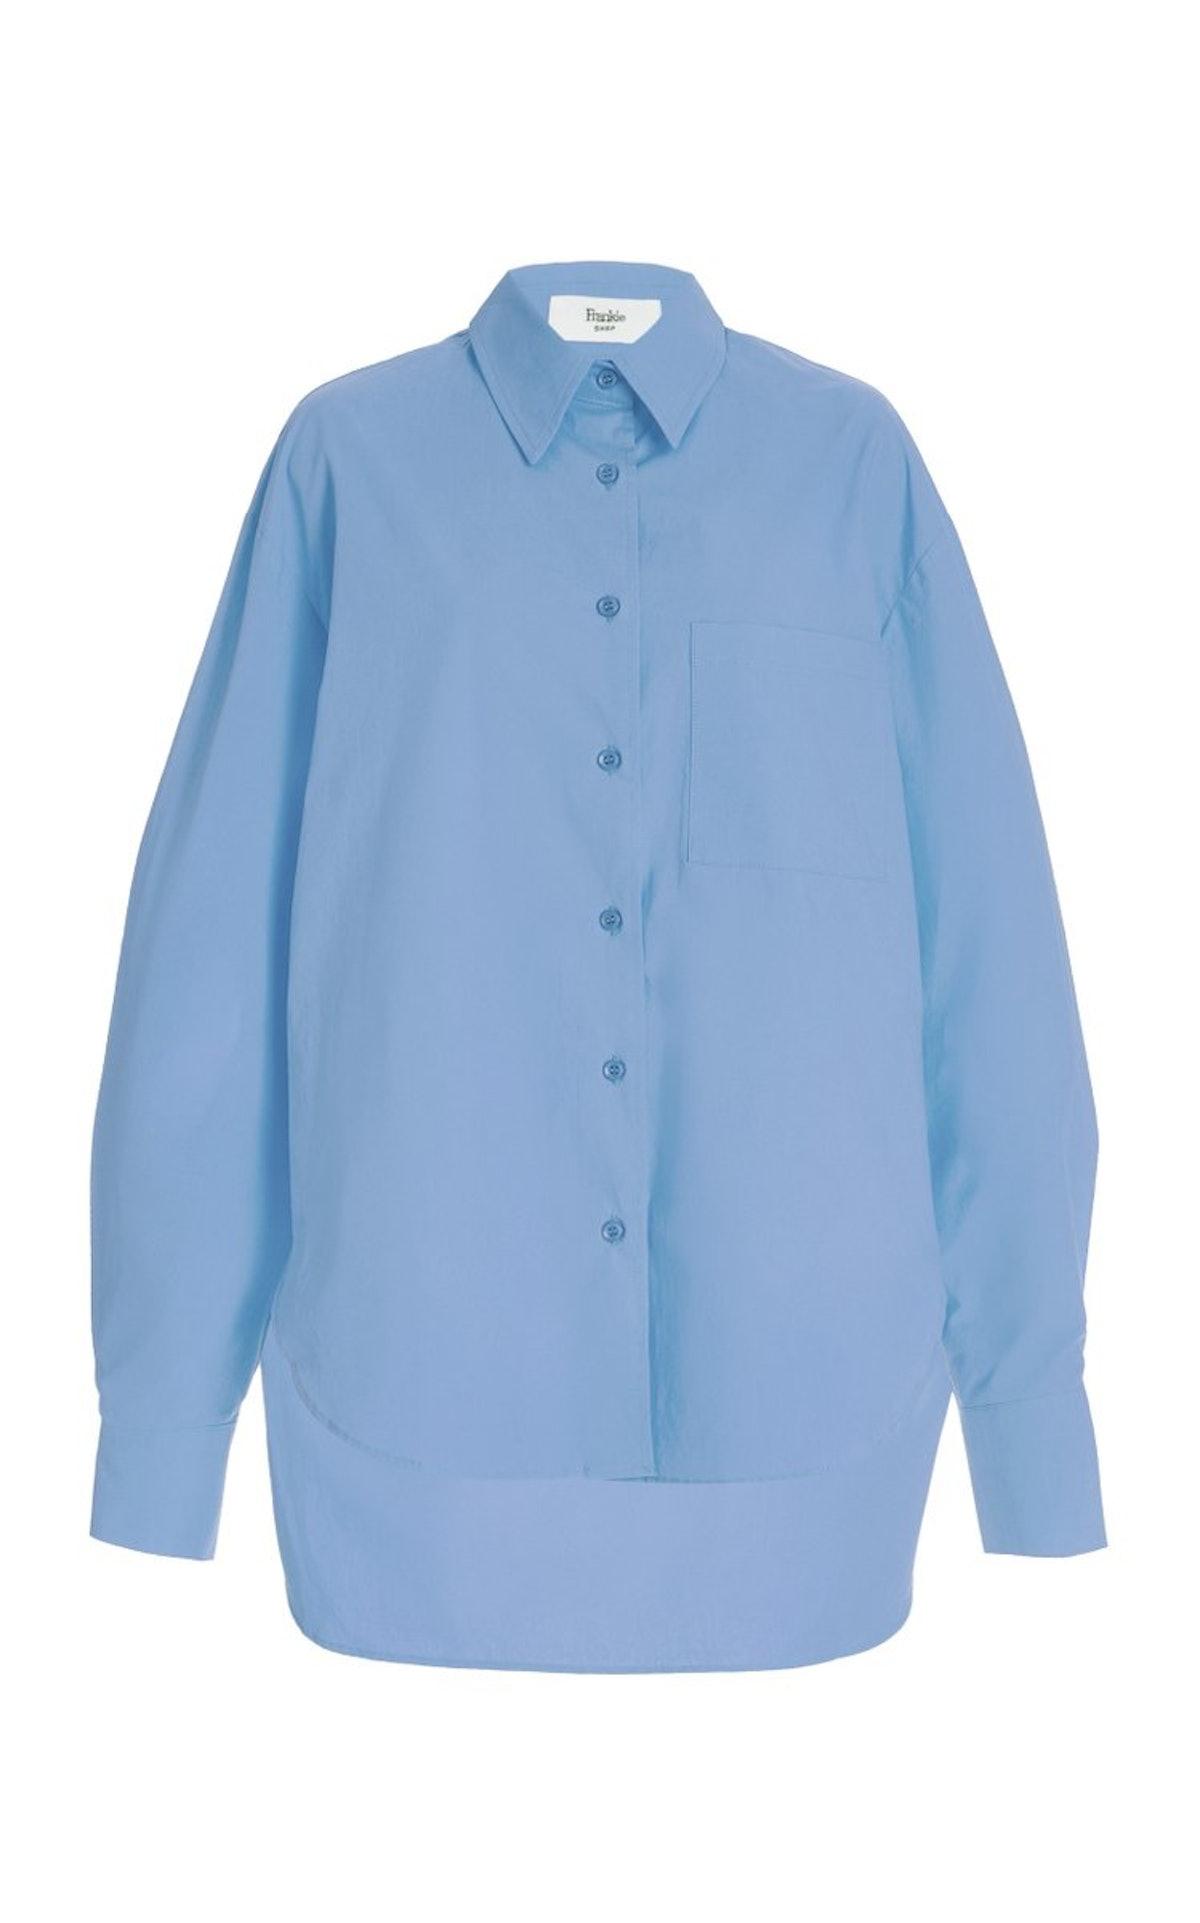 Lui Oversized Organic Cotton Shirt from The Frankie Shop, available on Moda Operandi.